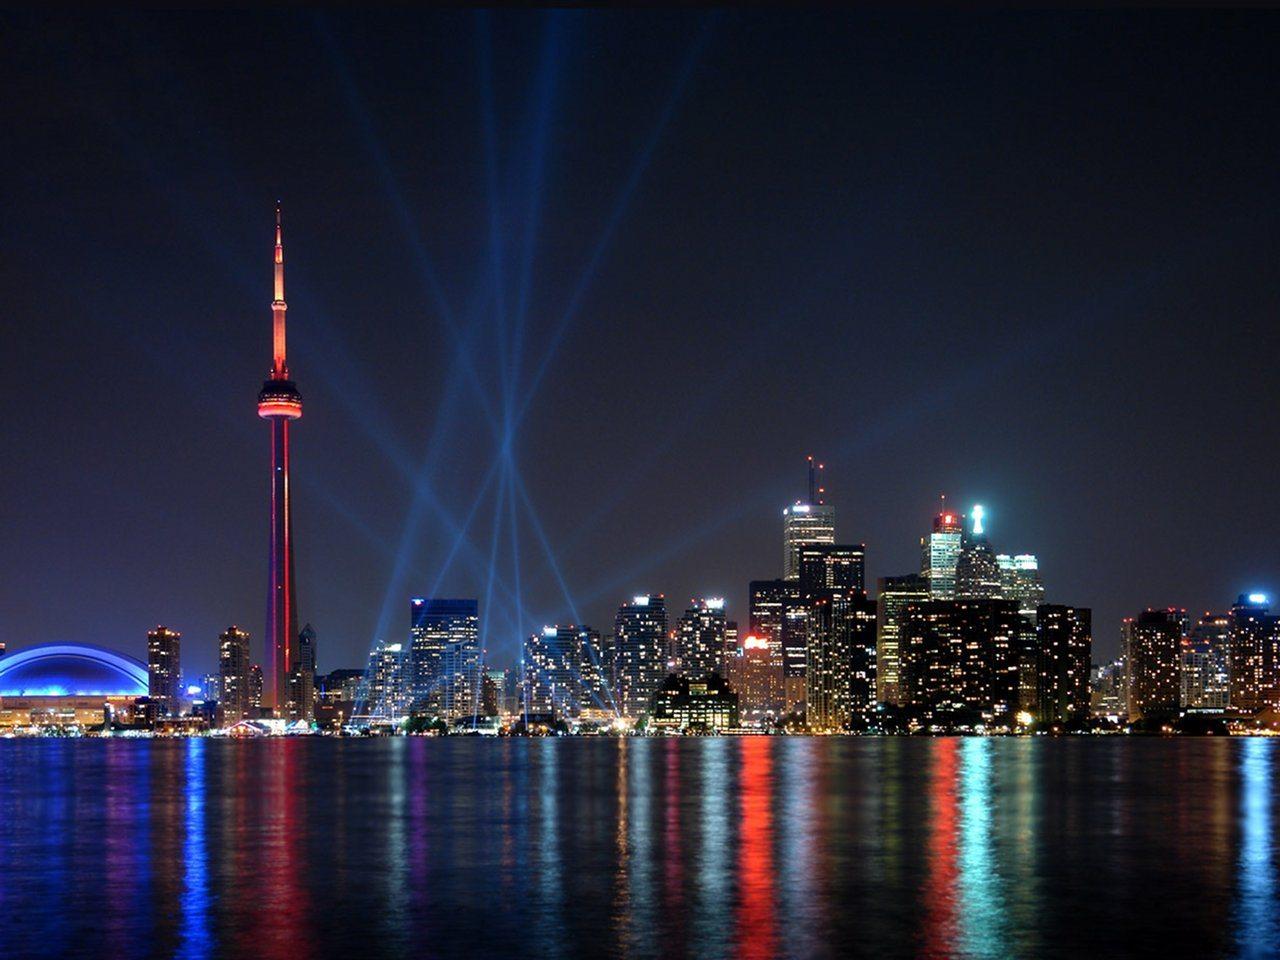 Motivos para visitar Toronto, no Canadá